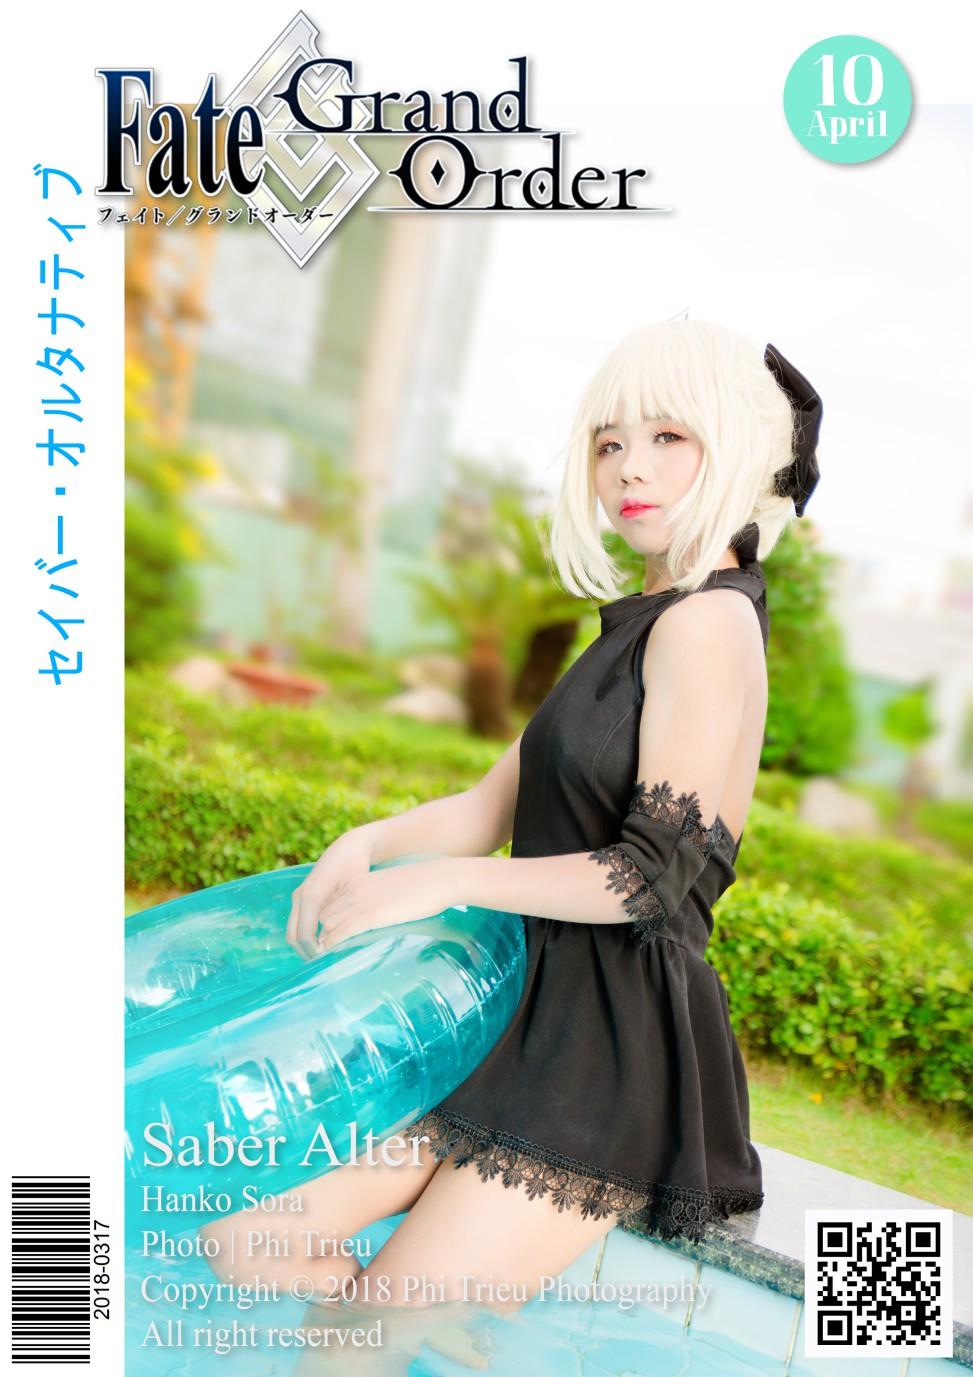 Saber Alter (Swimsuit) | Hanko Sora